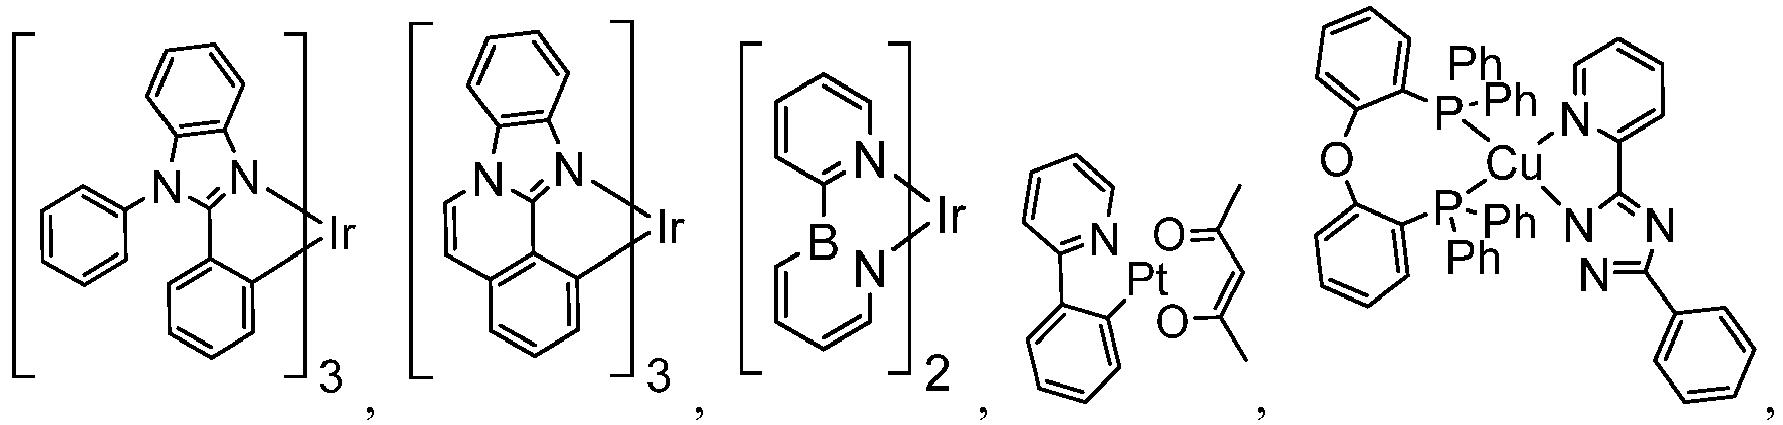 Figure imgb0915